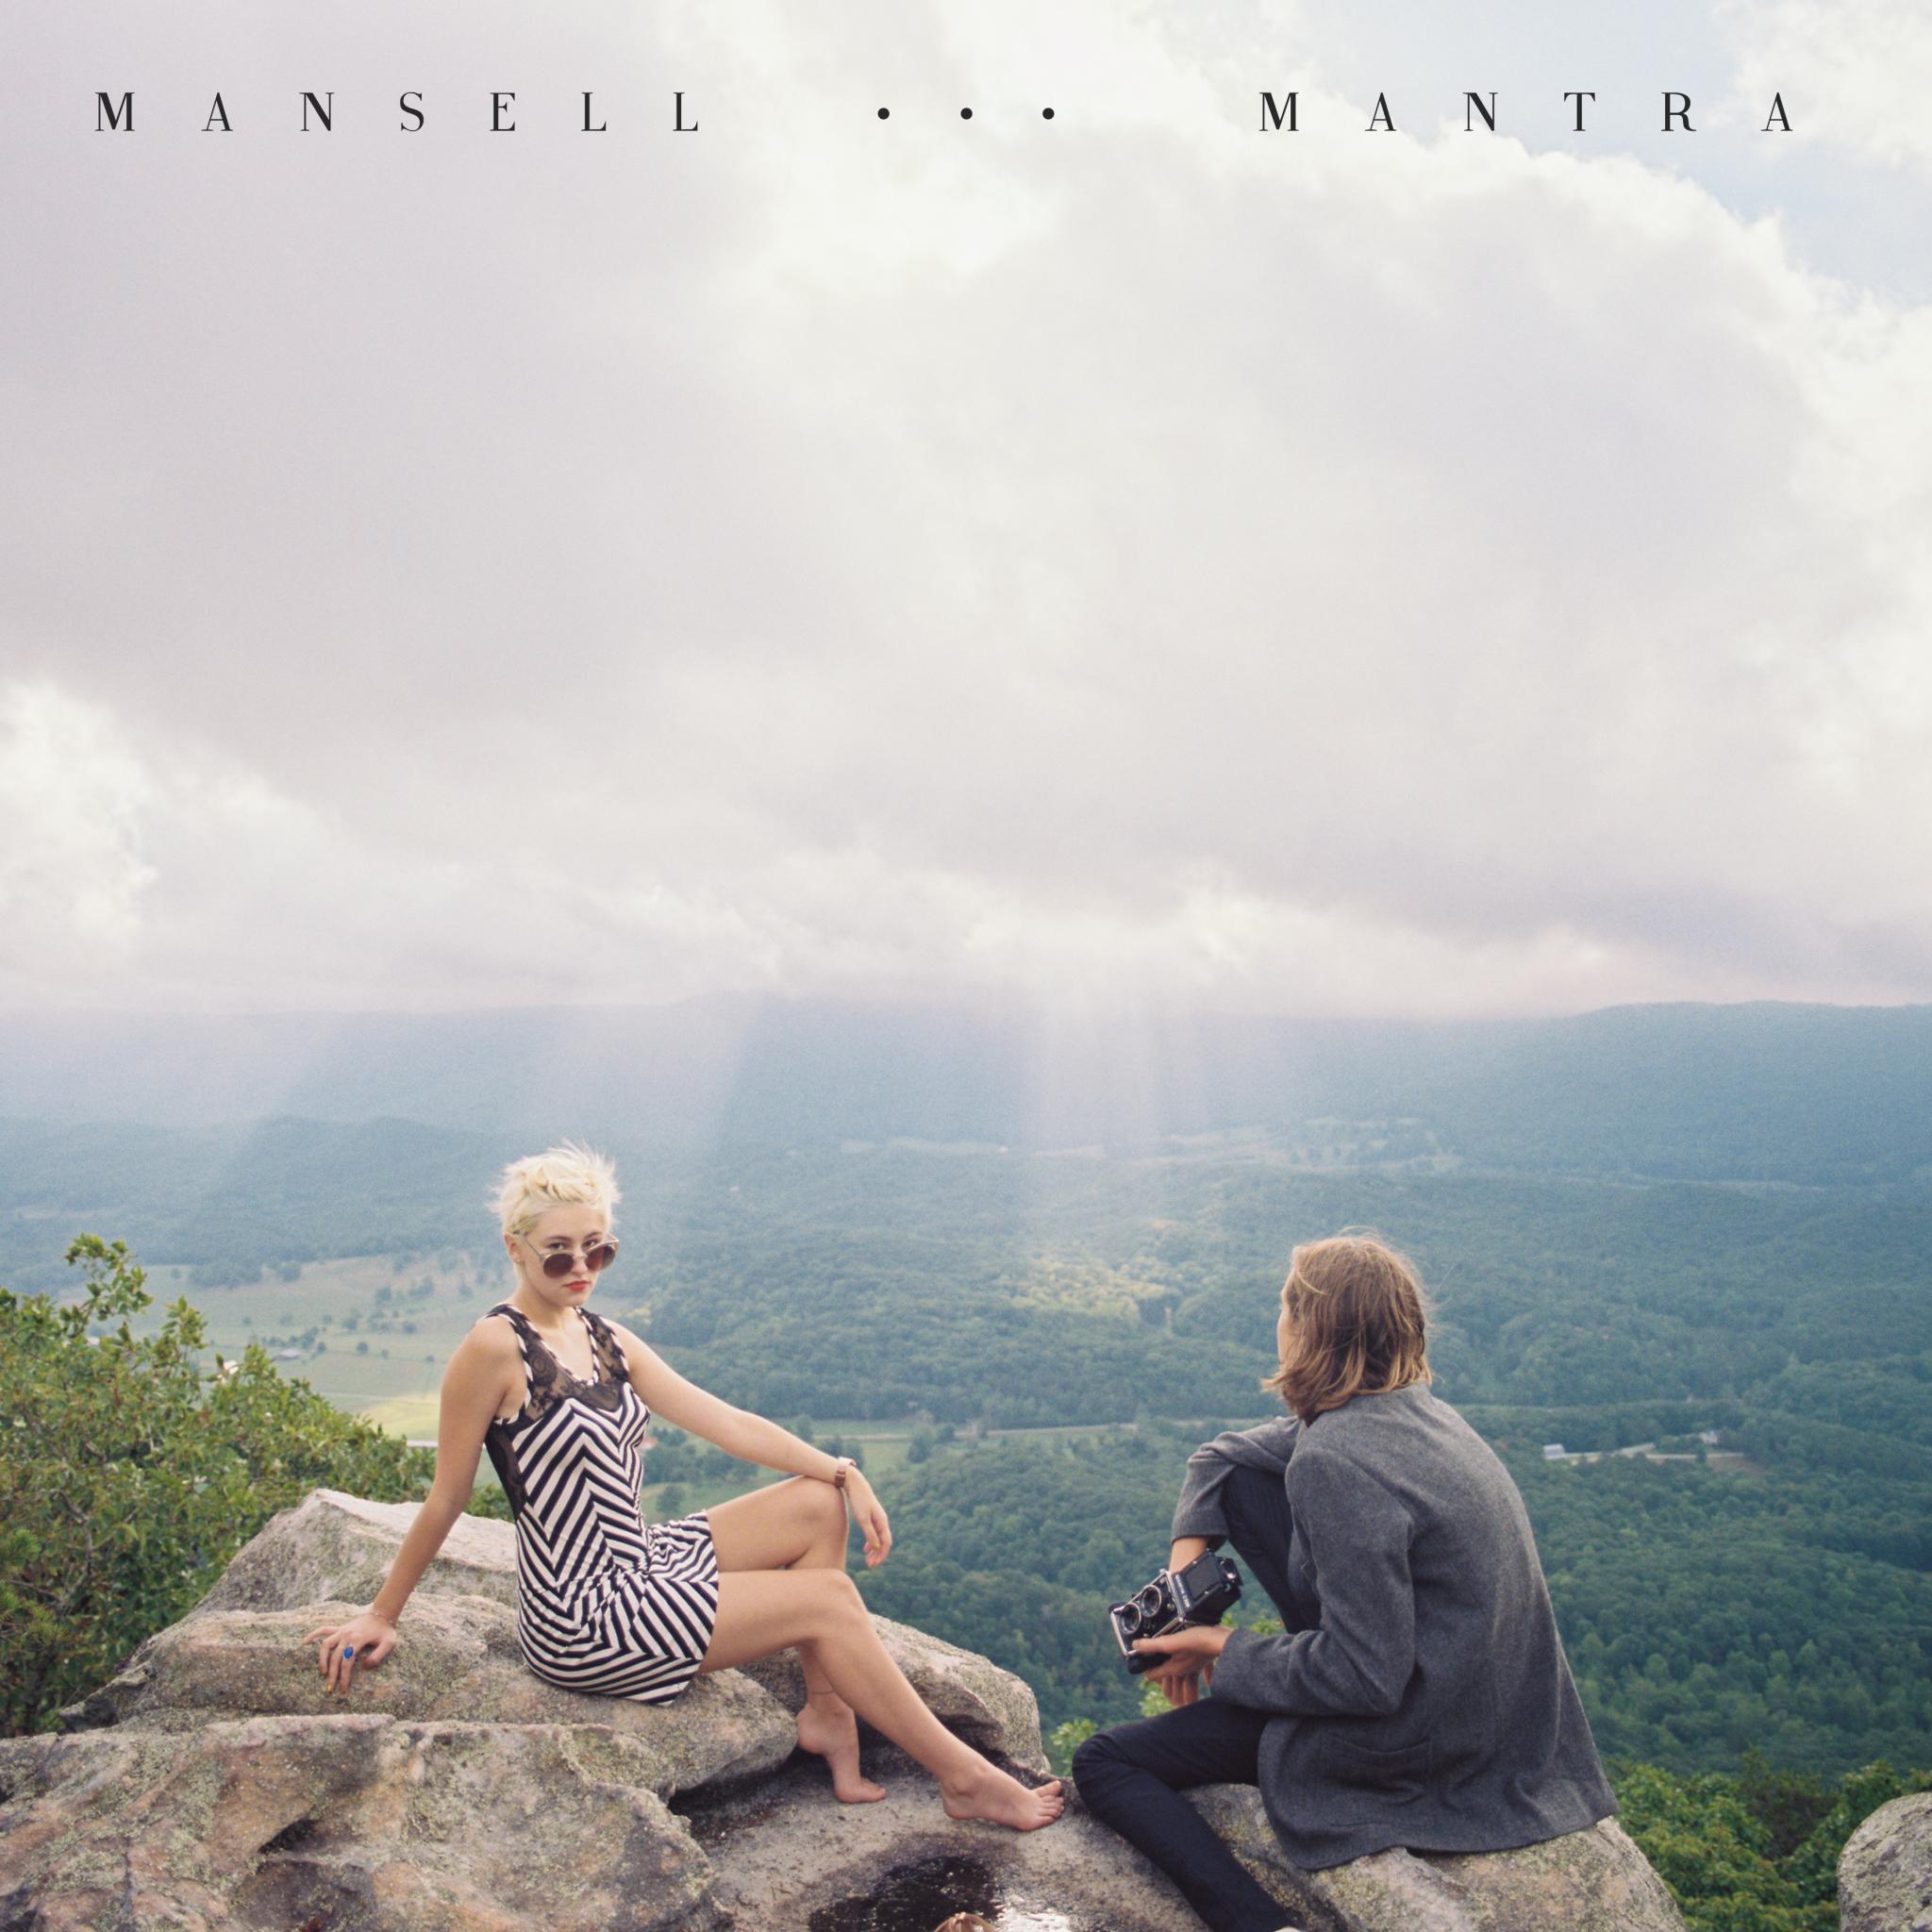 mansell-mantra